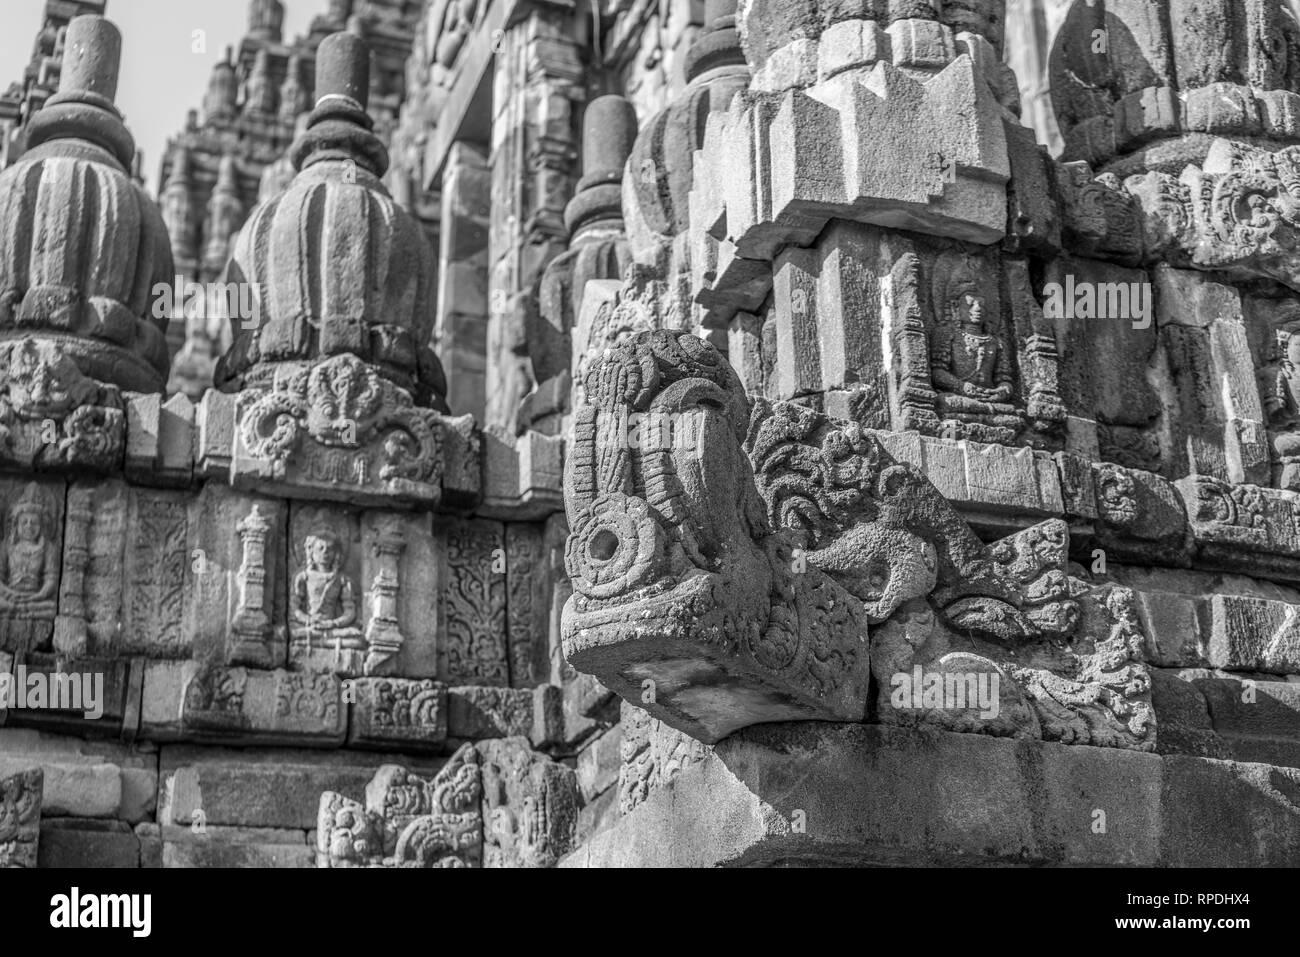 Gargoyle at Candi Siwa (Shiva Temple) in Prambanan temple complex. 9th century Hindu temple compound located near Yogyakarta on Central Java, Indonesi - Stock Image